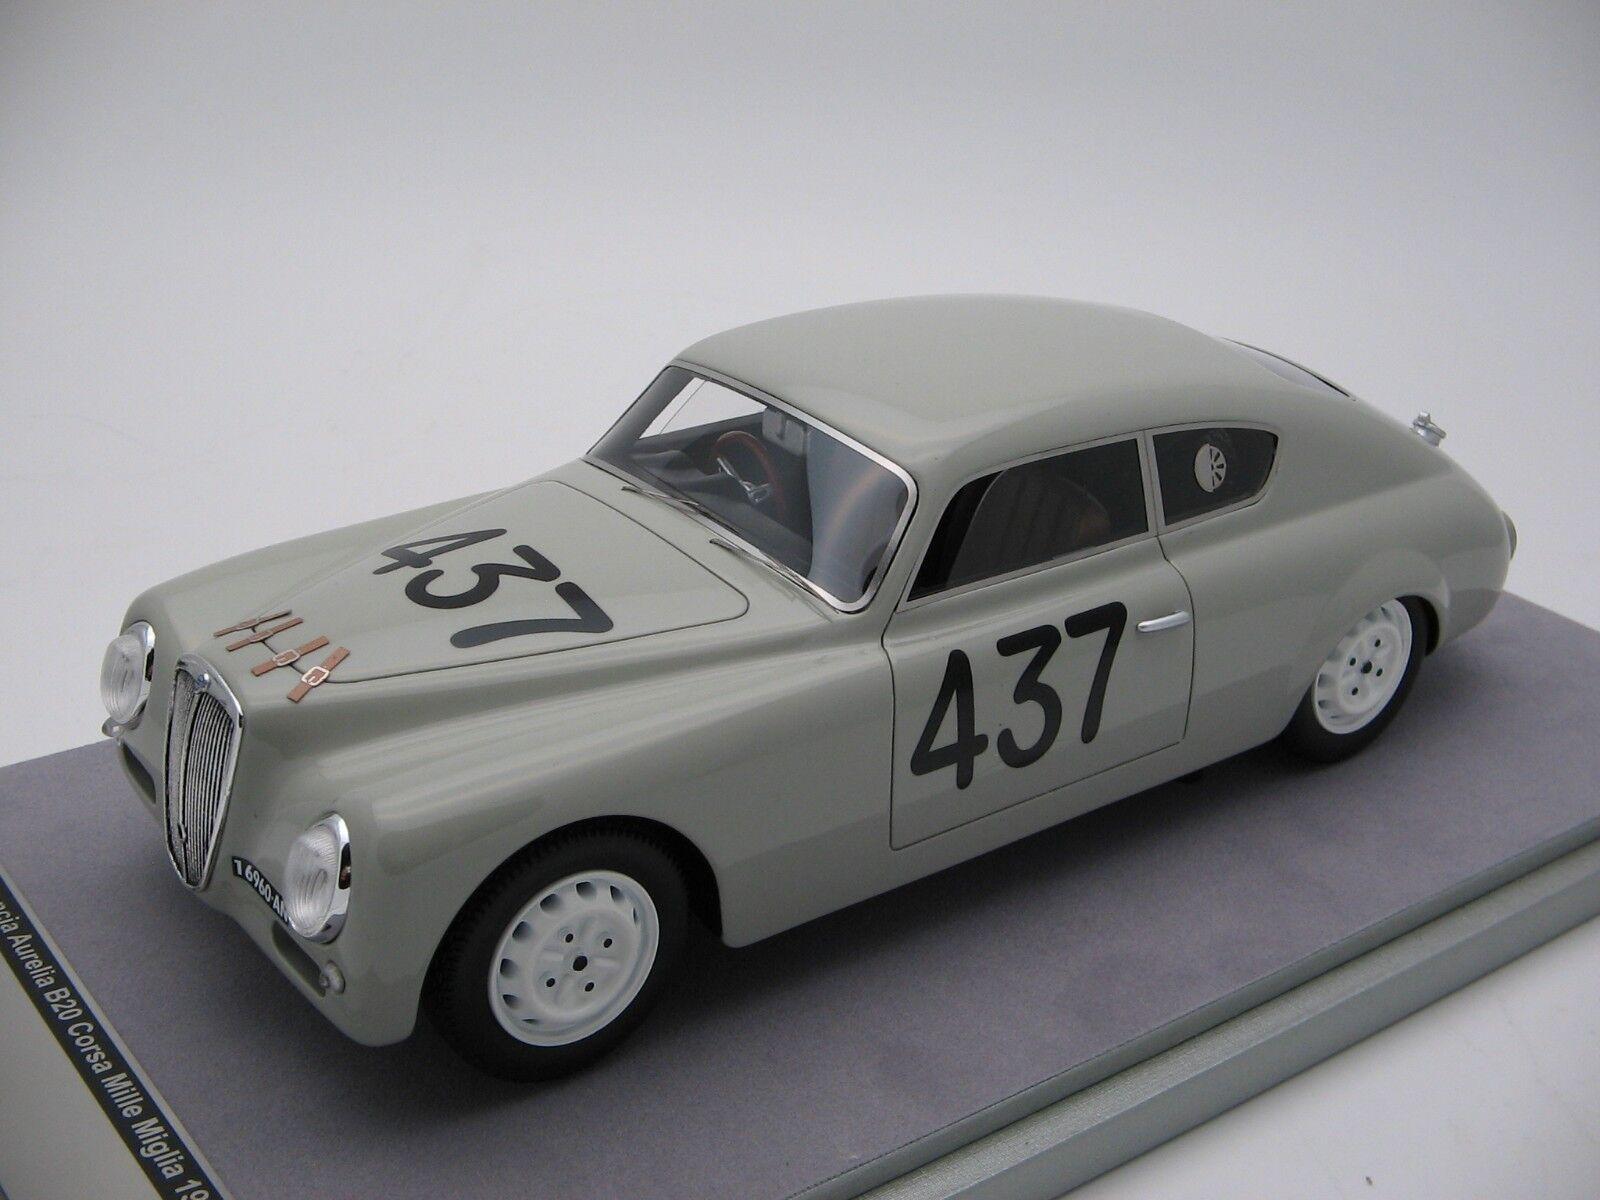 1 18 Scale Tecnomodel Spear Aurelia B20 Corsa Mille Miles 1952 TM18-69D